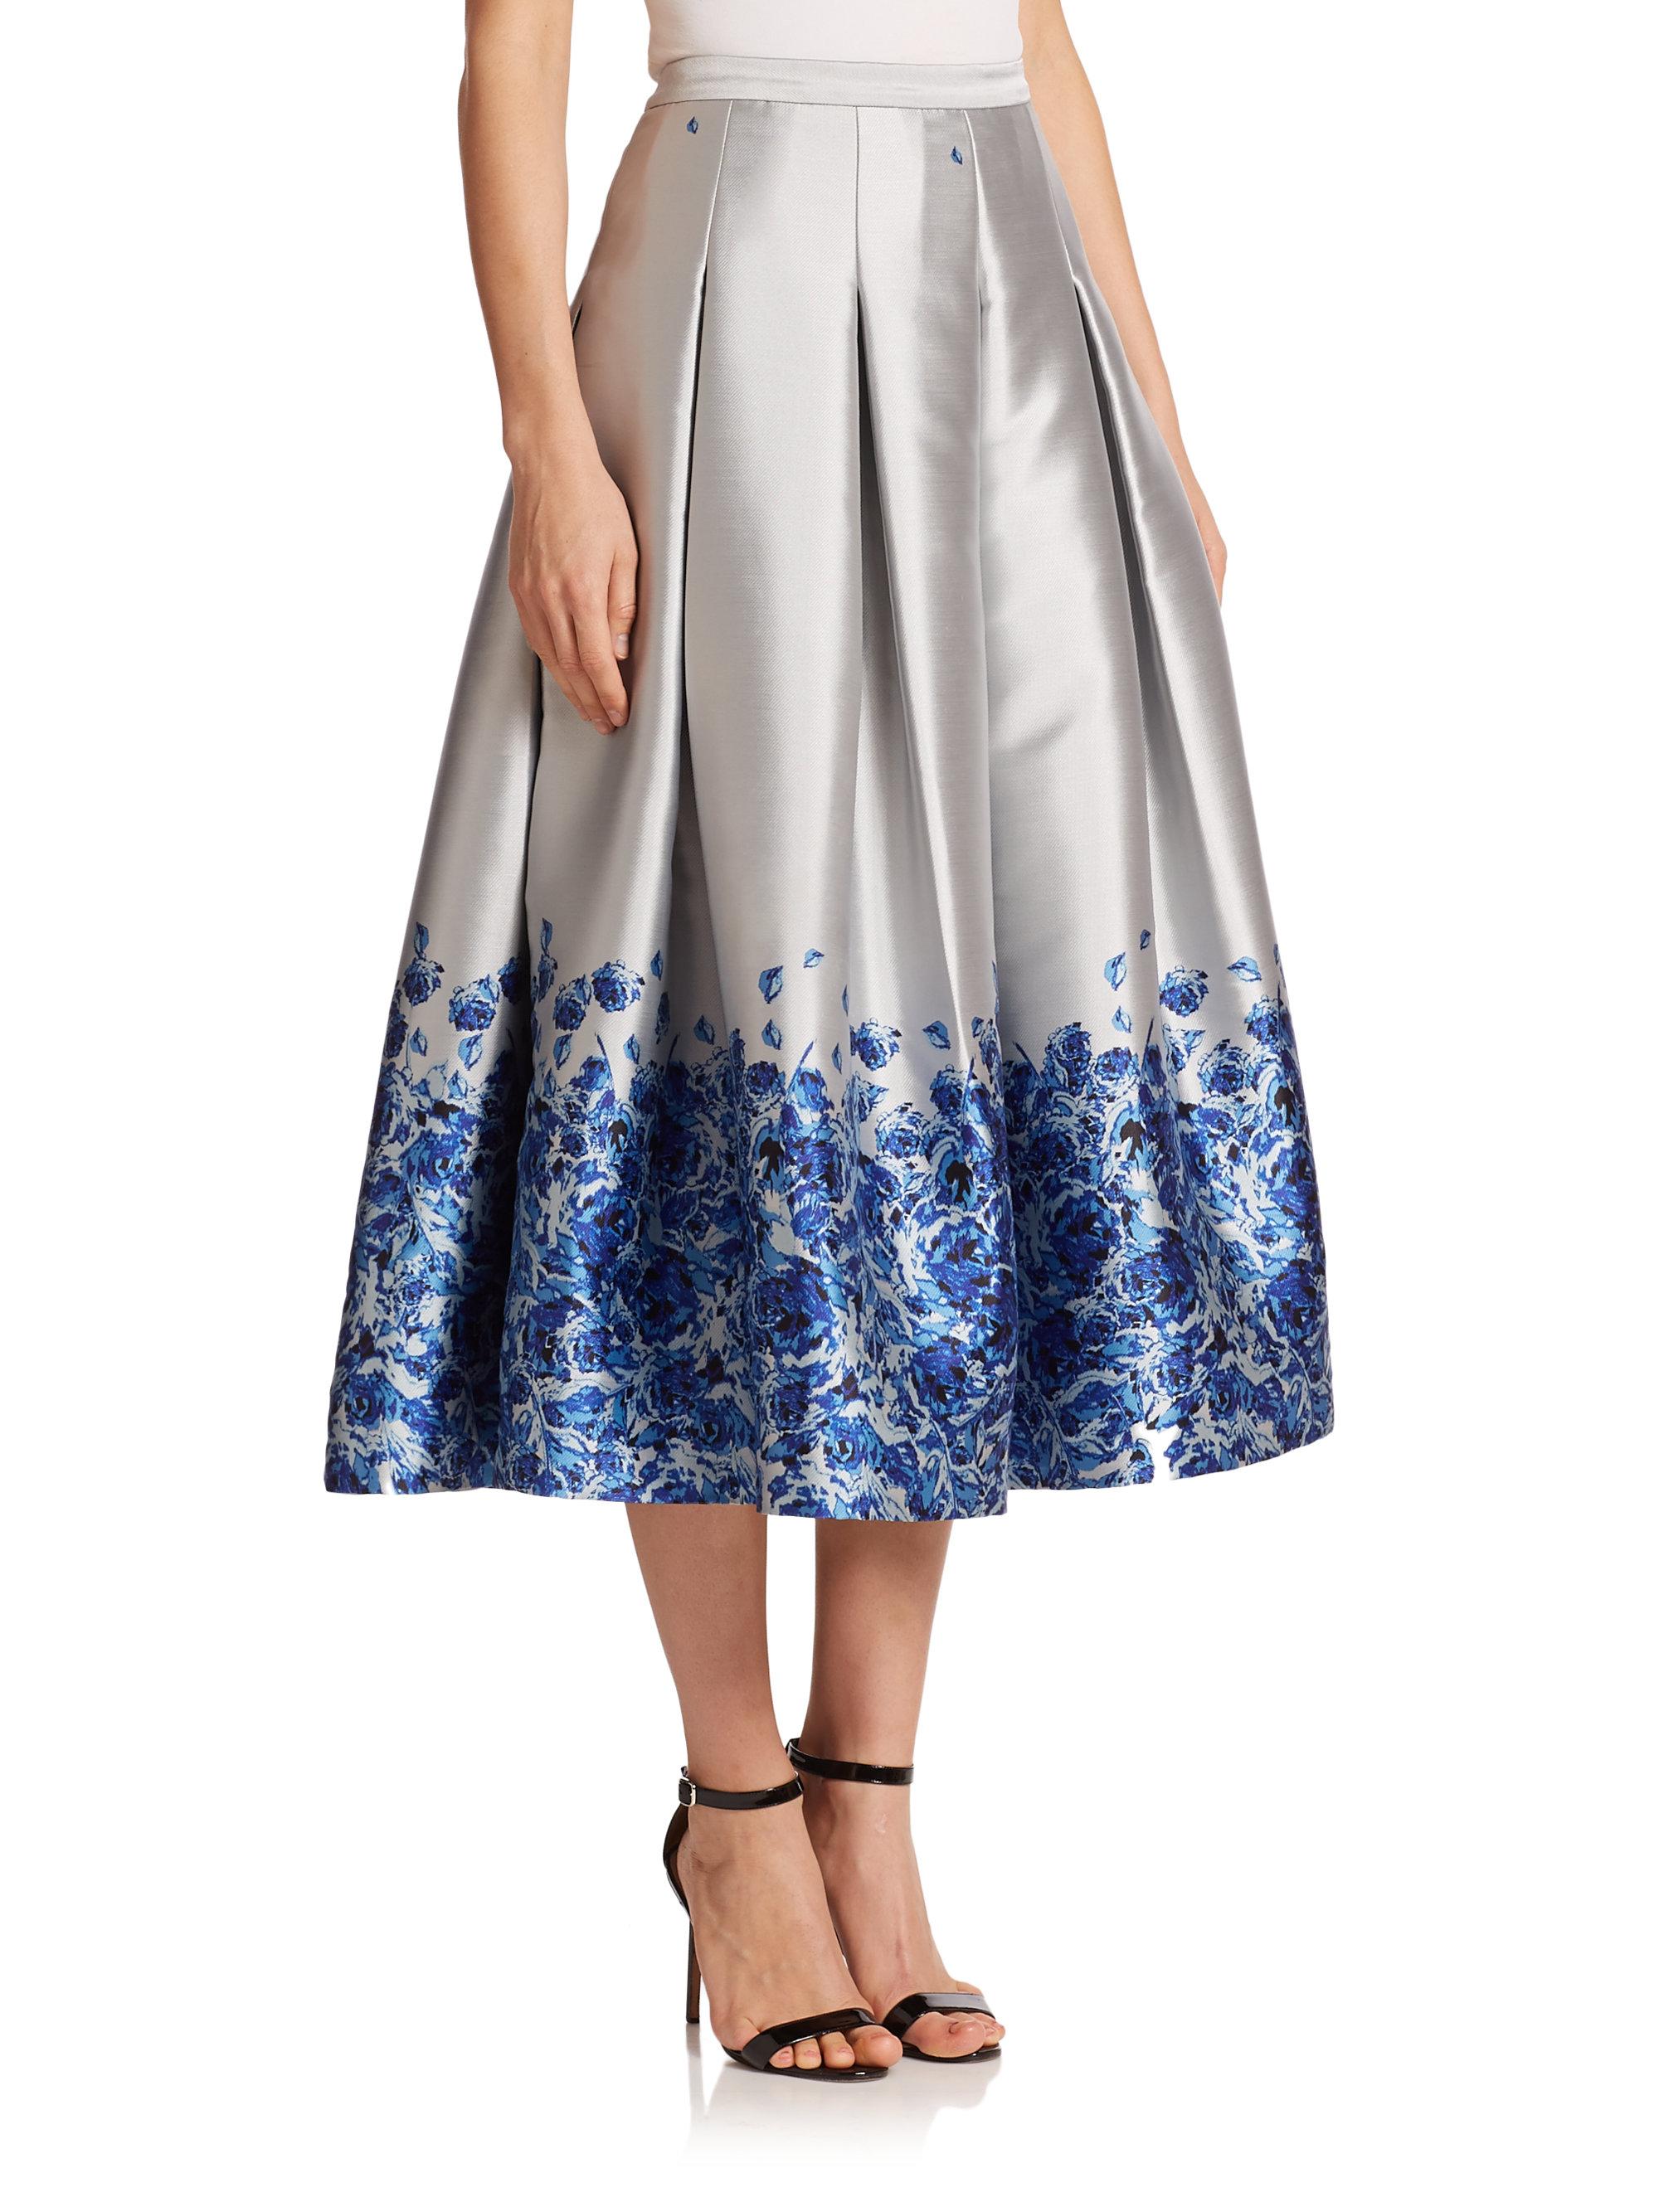 Sachin & babi Confetti Floral Satin Midi Skirt in Blue | Lyst